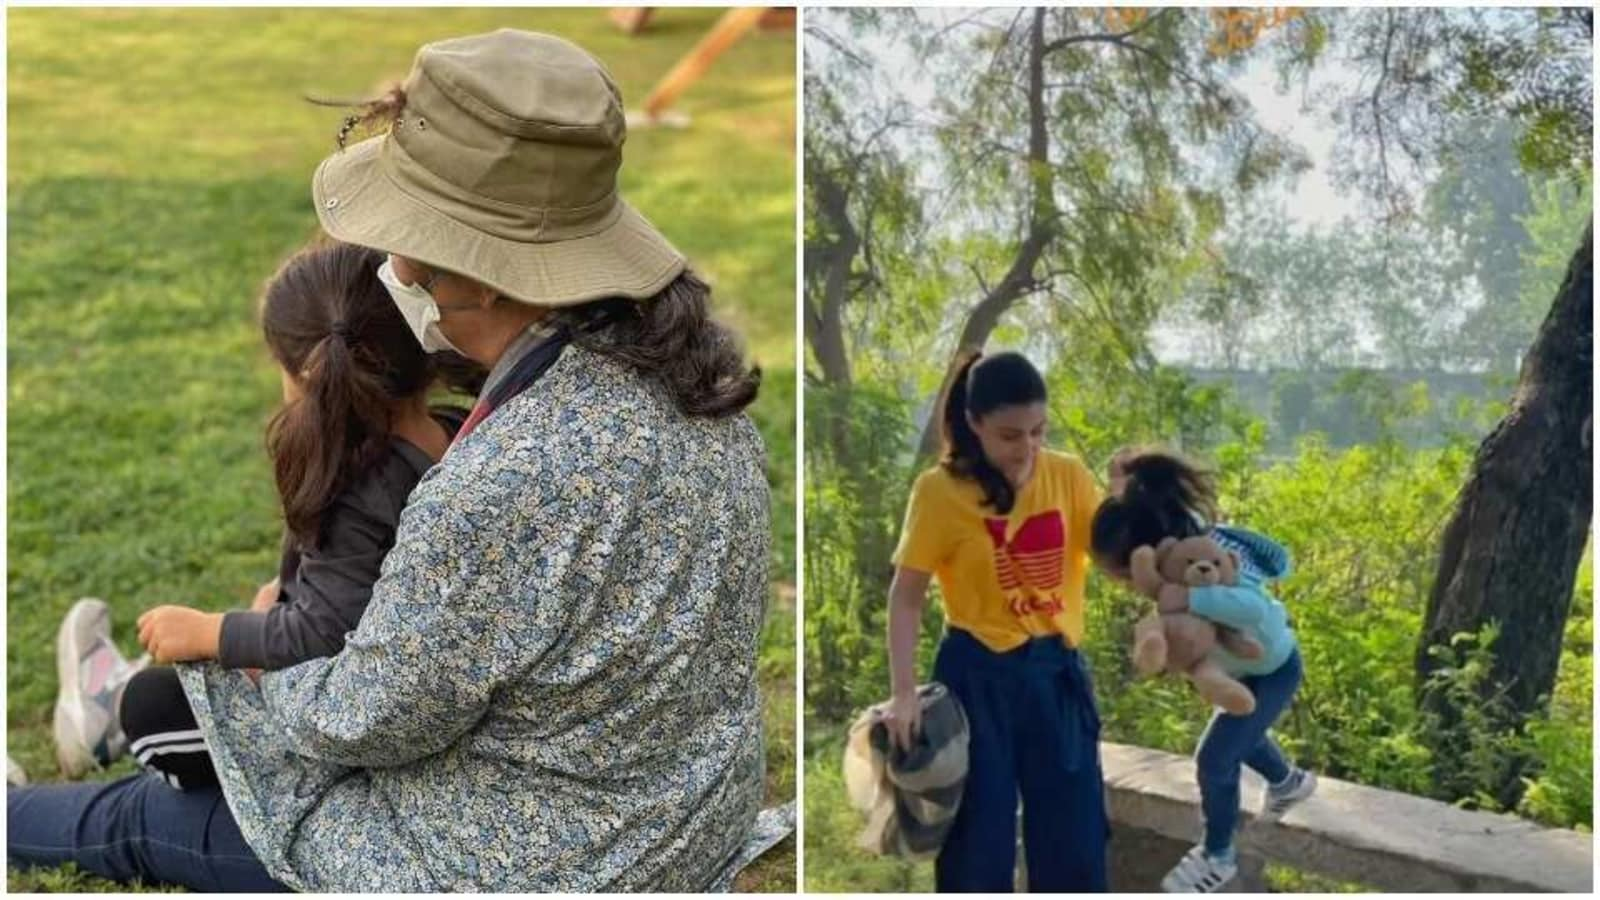 After reunion with grandma Sharmila Tagore in Pataudi, Inaaya goes on nature walk with mom Soha Ali Khan - Hindustan Times